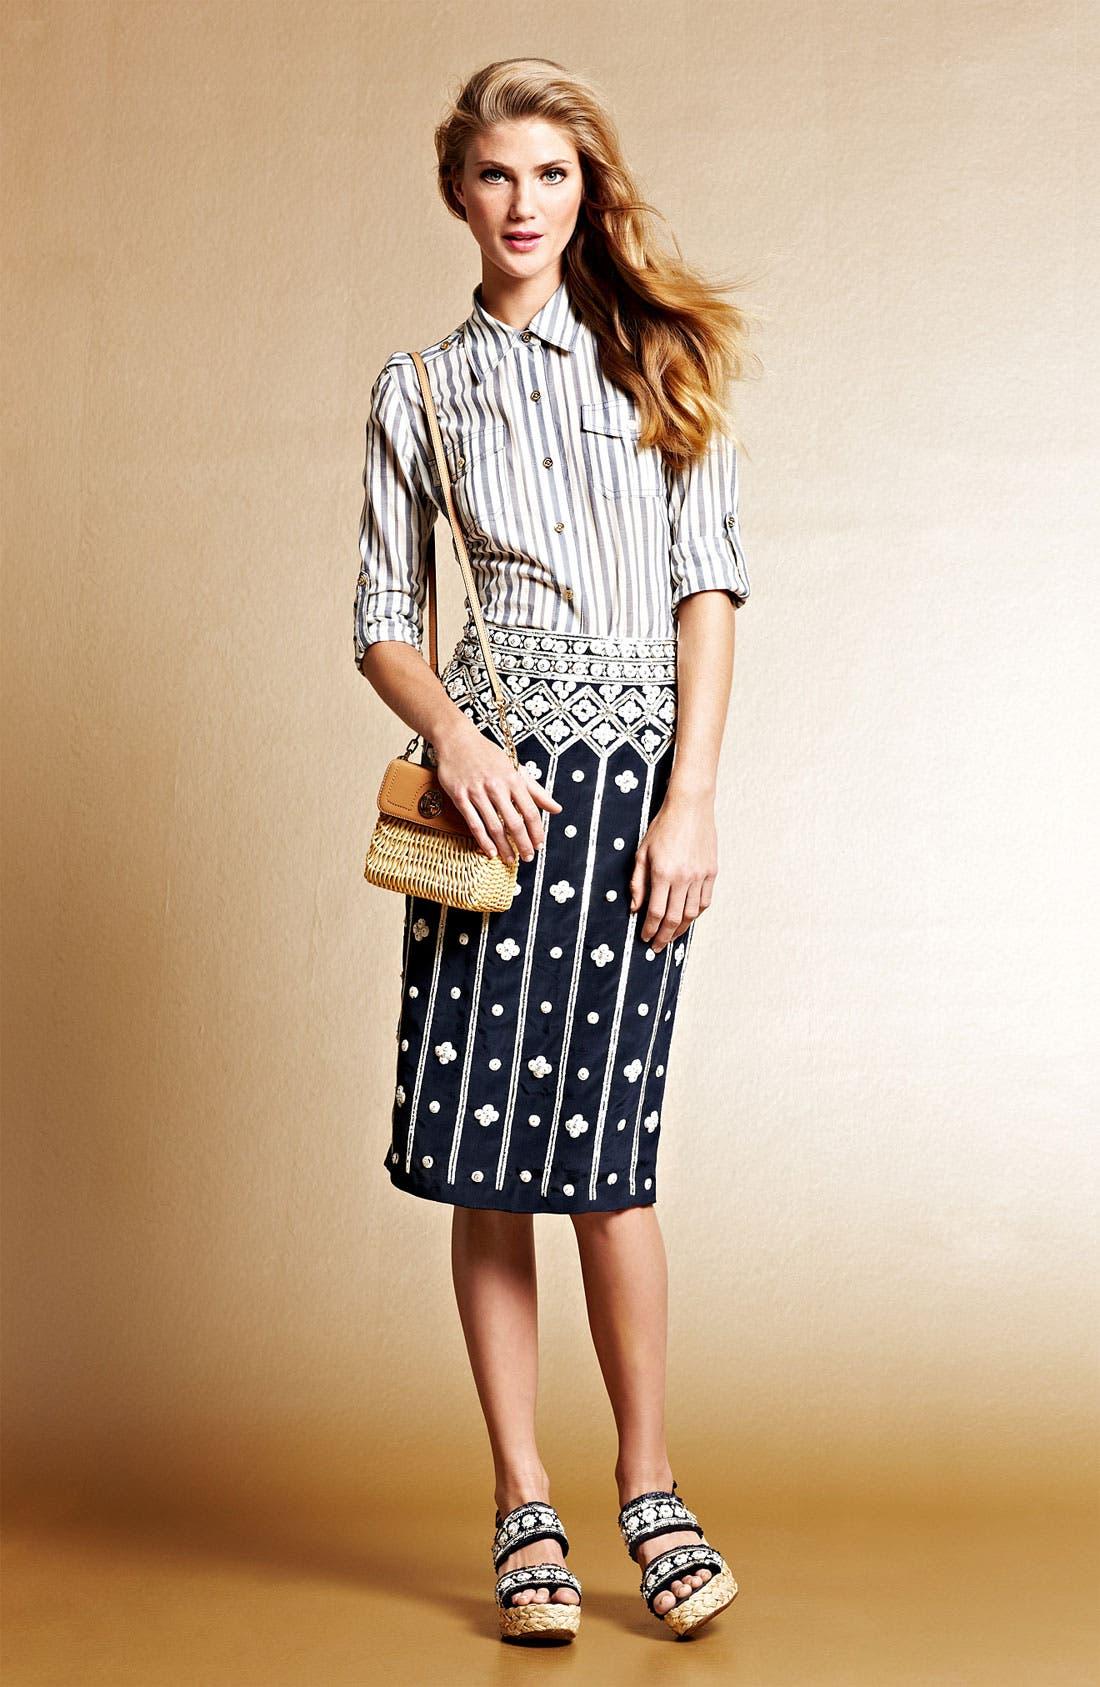 Main Image - Tory Burch Shirt & Sequin Skirt